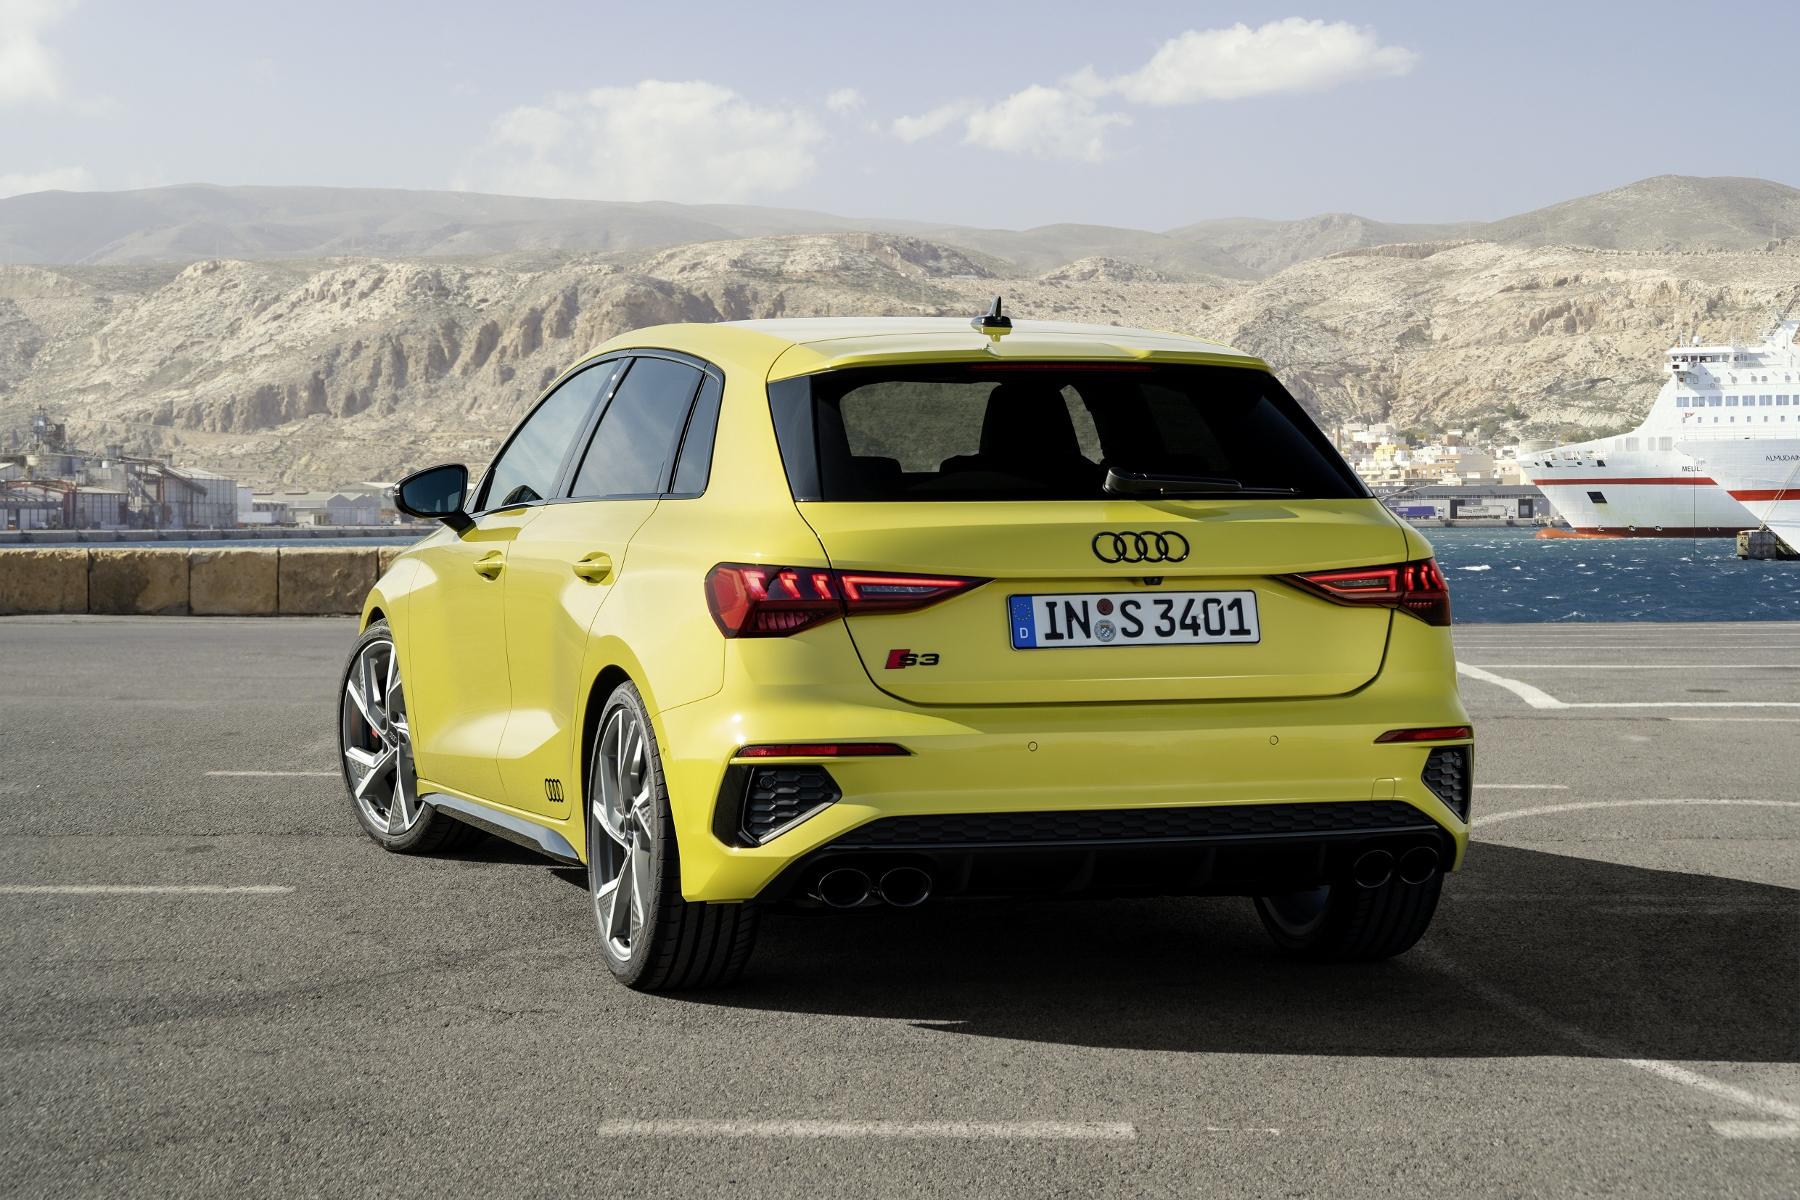 Audi ukázalo modely S3 Sedan a Sportback. Prezradilo aj nemeckú cenu vzRtOl2IWA a204401large-1800x12